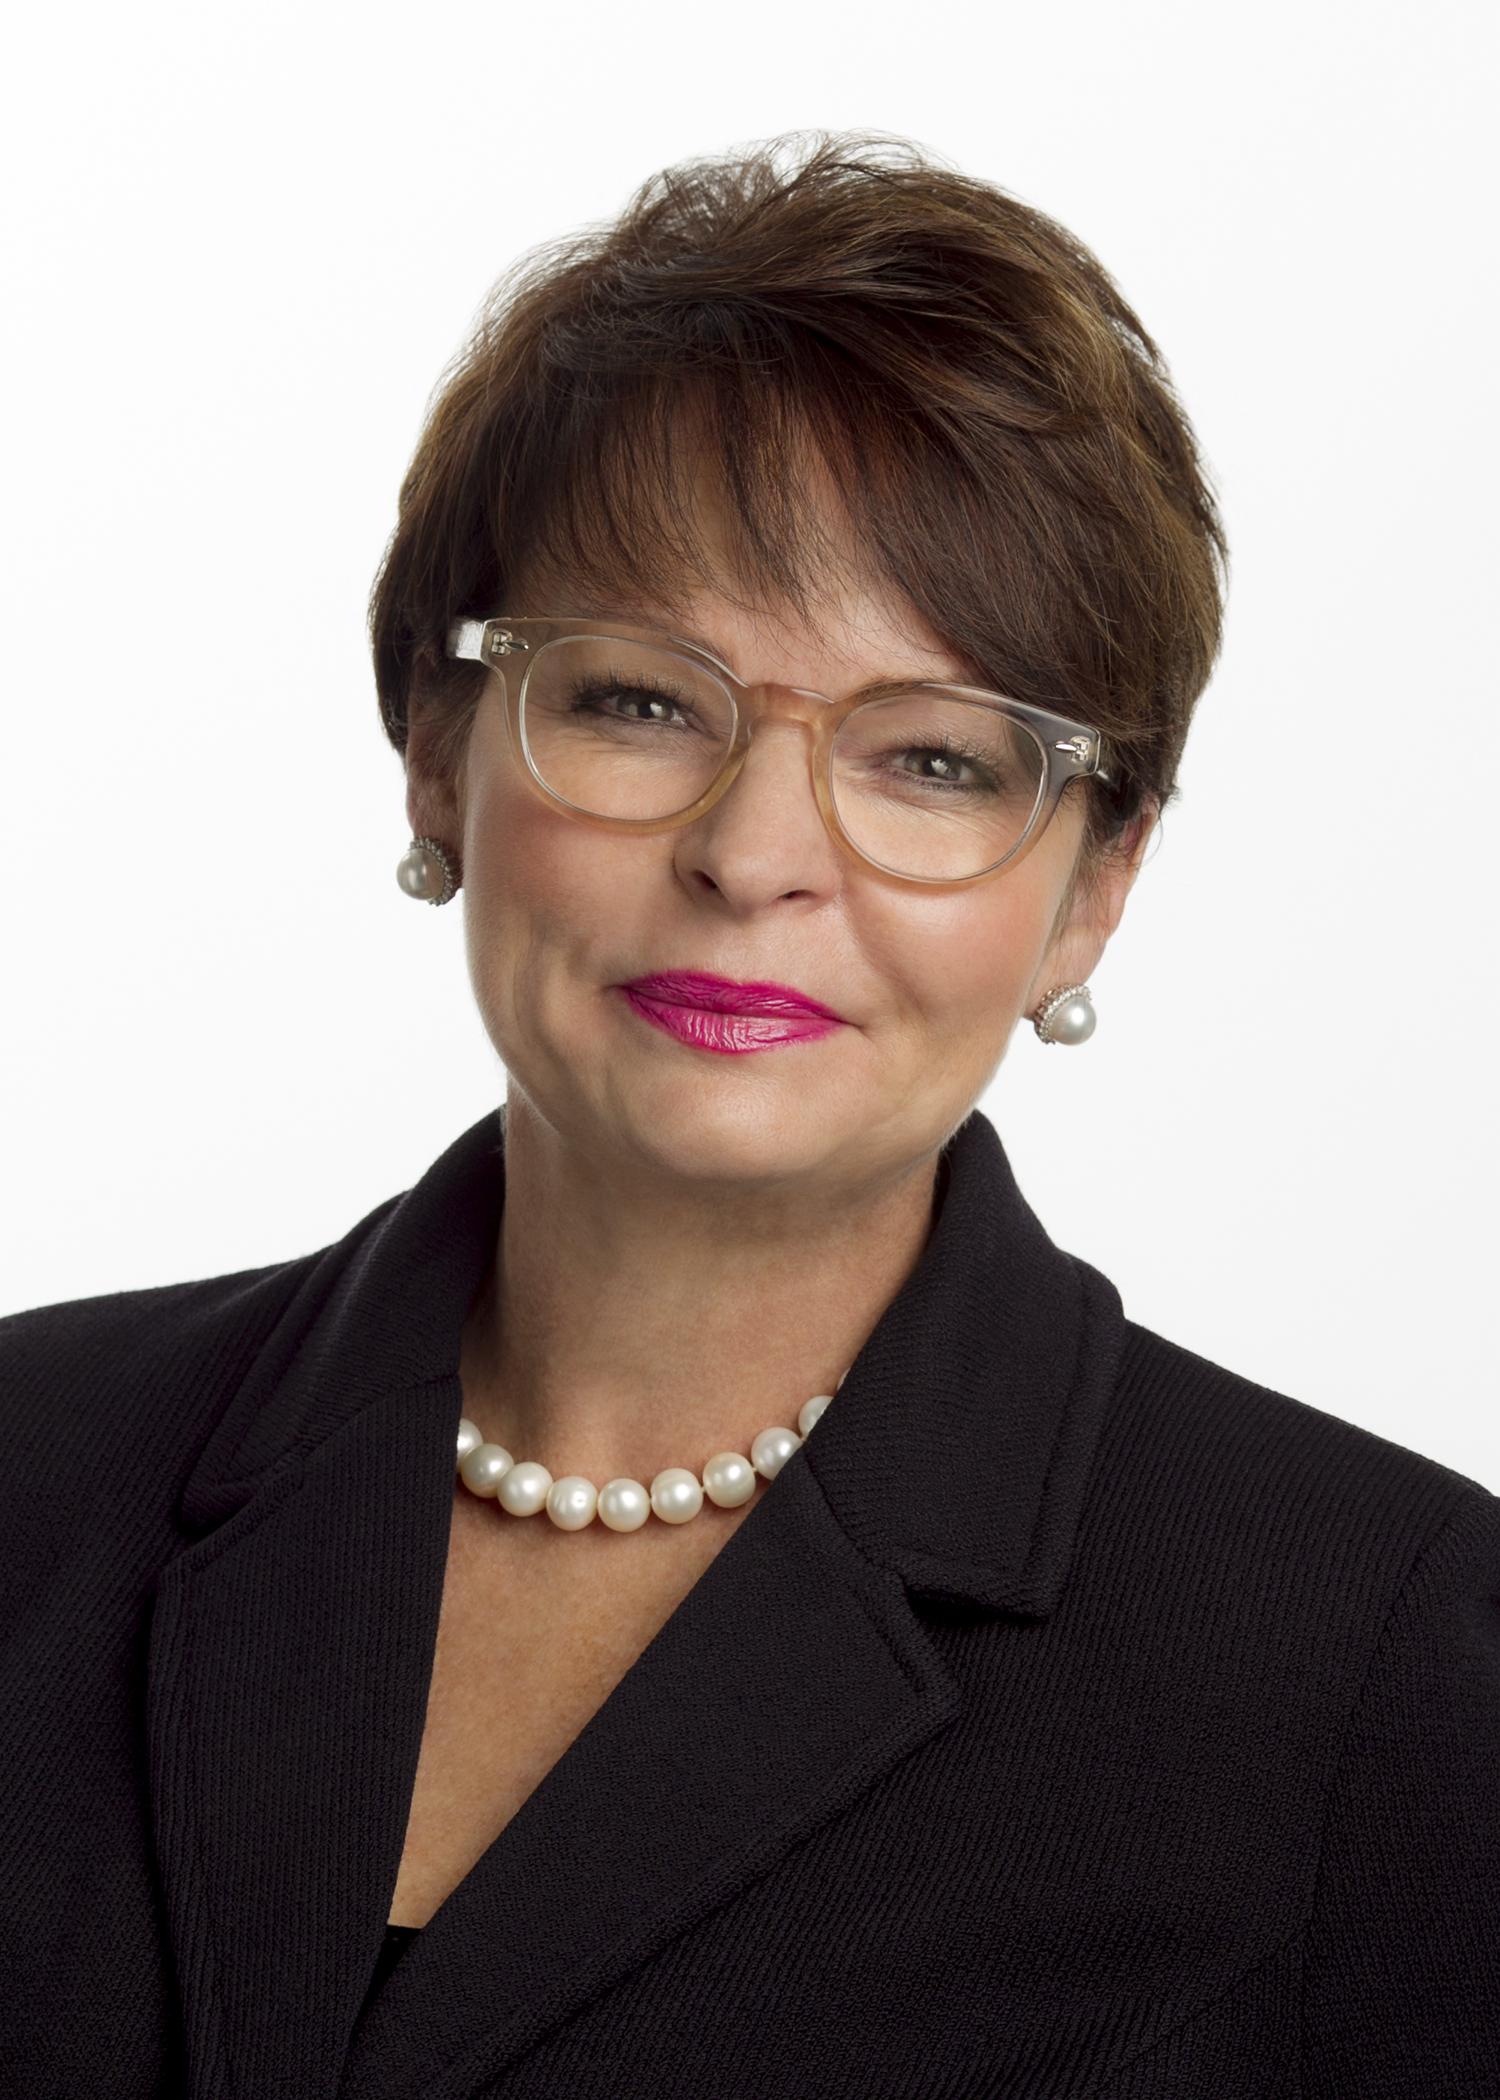 Kathleen Droste